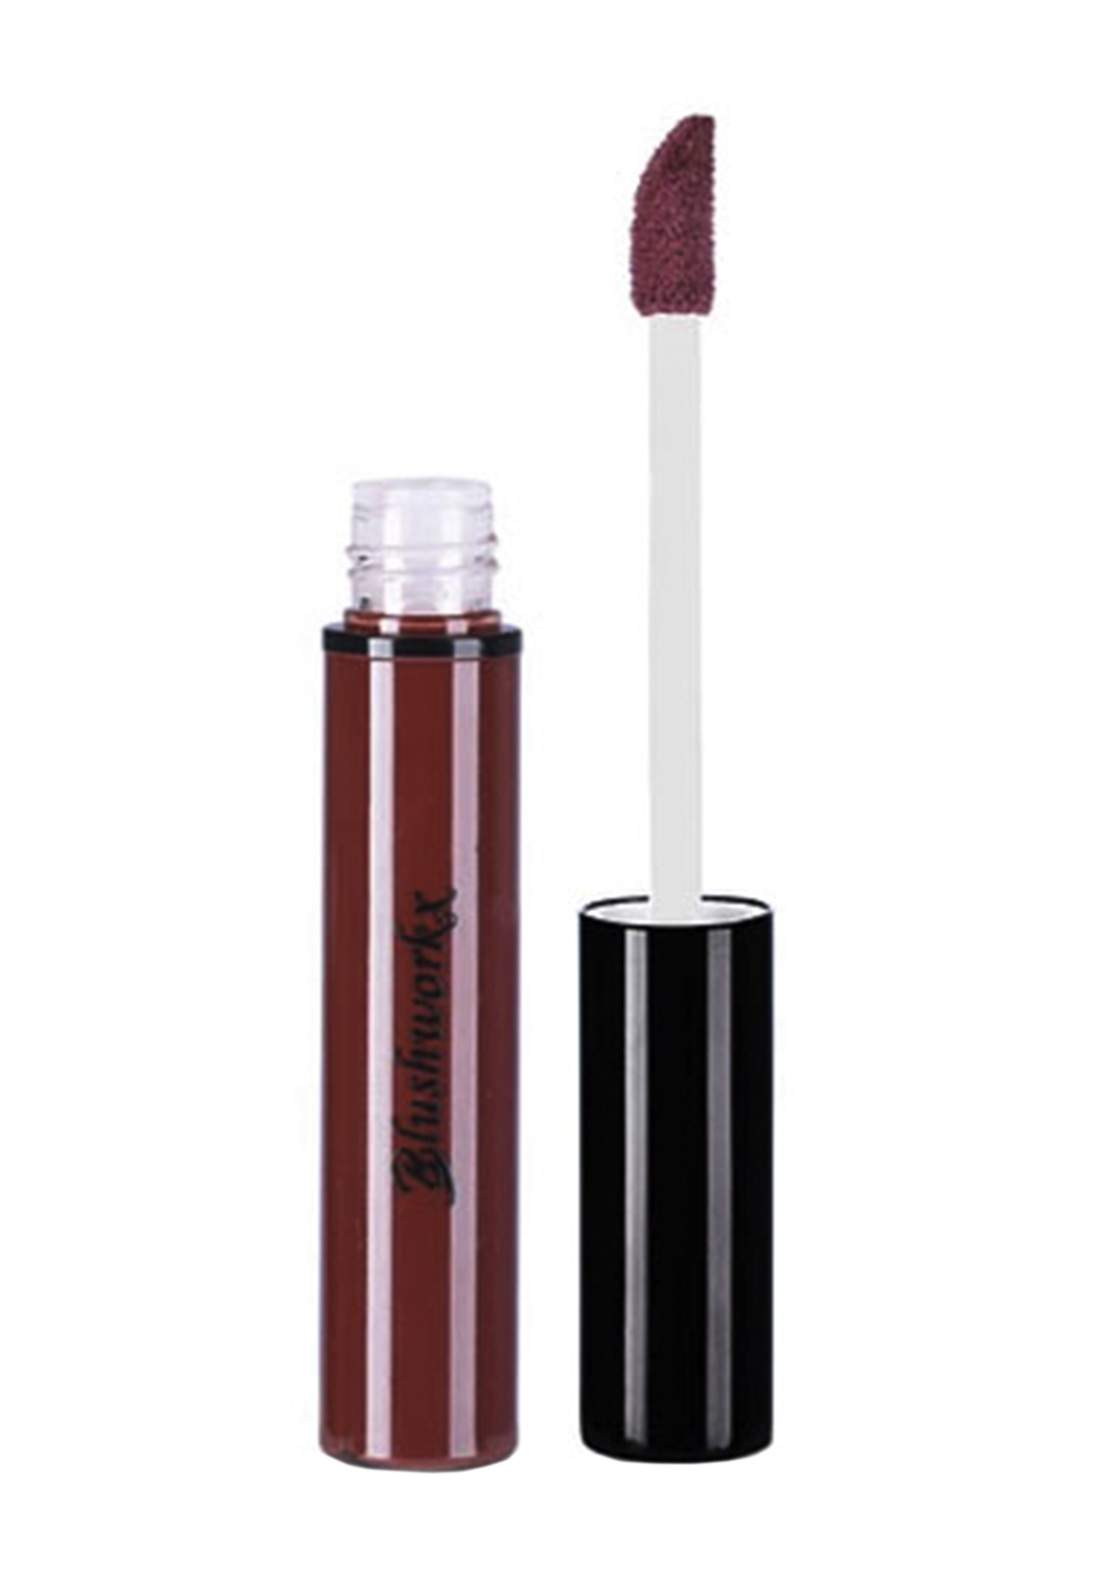 Blushworkx Hollywood Lip Lacquers 5.7g Cocoa احمر شفاه